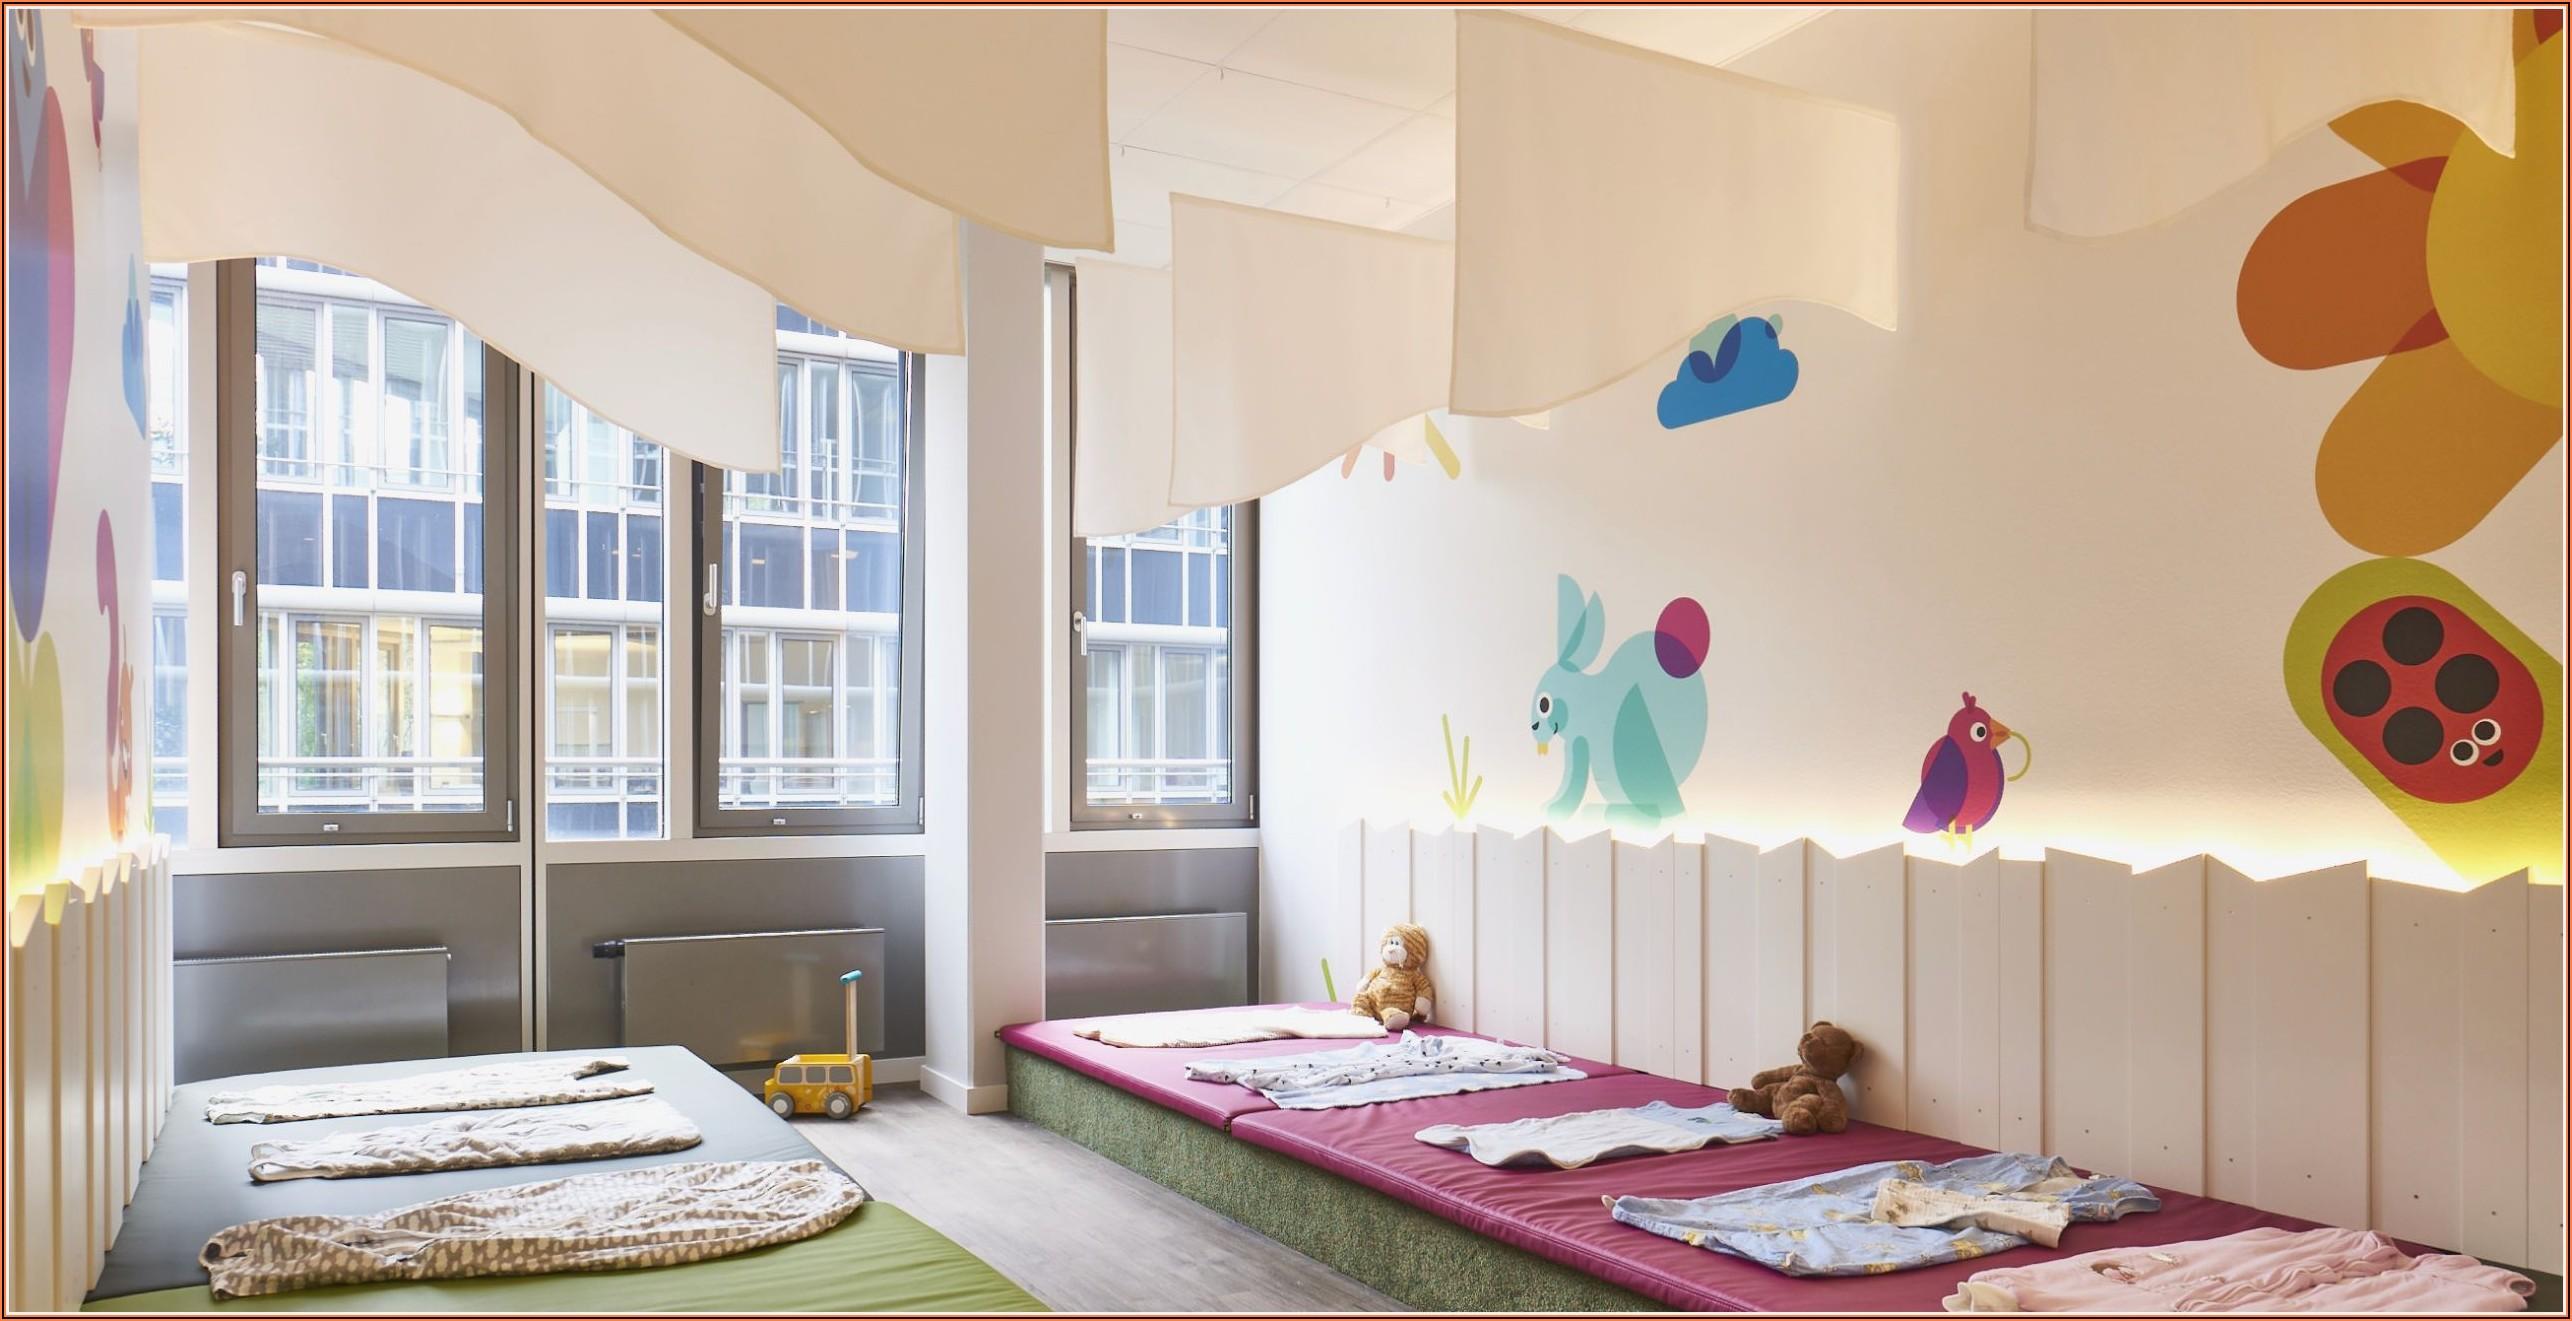 Kita Kinderzimmer Goldbek Hamburg